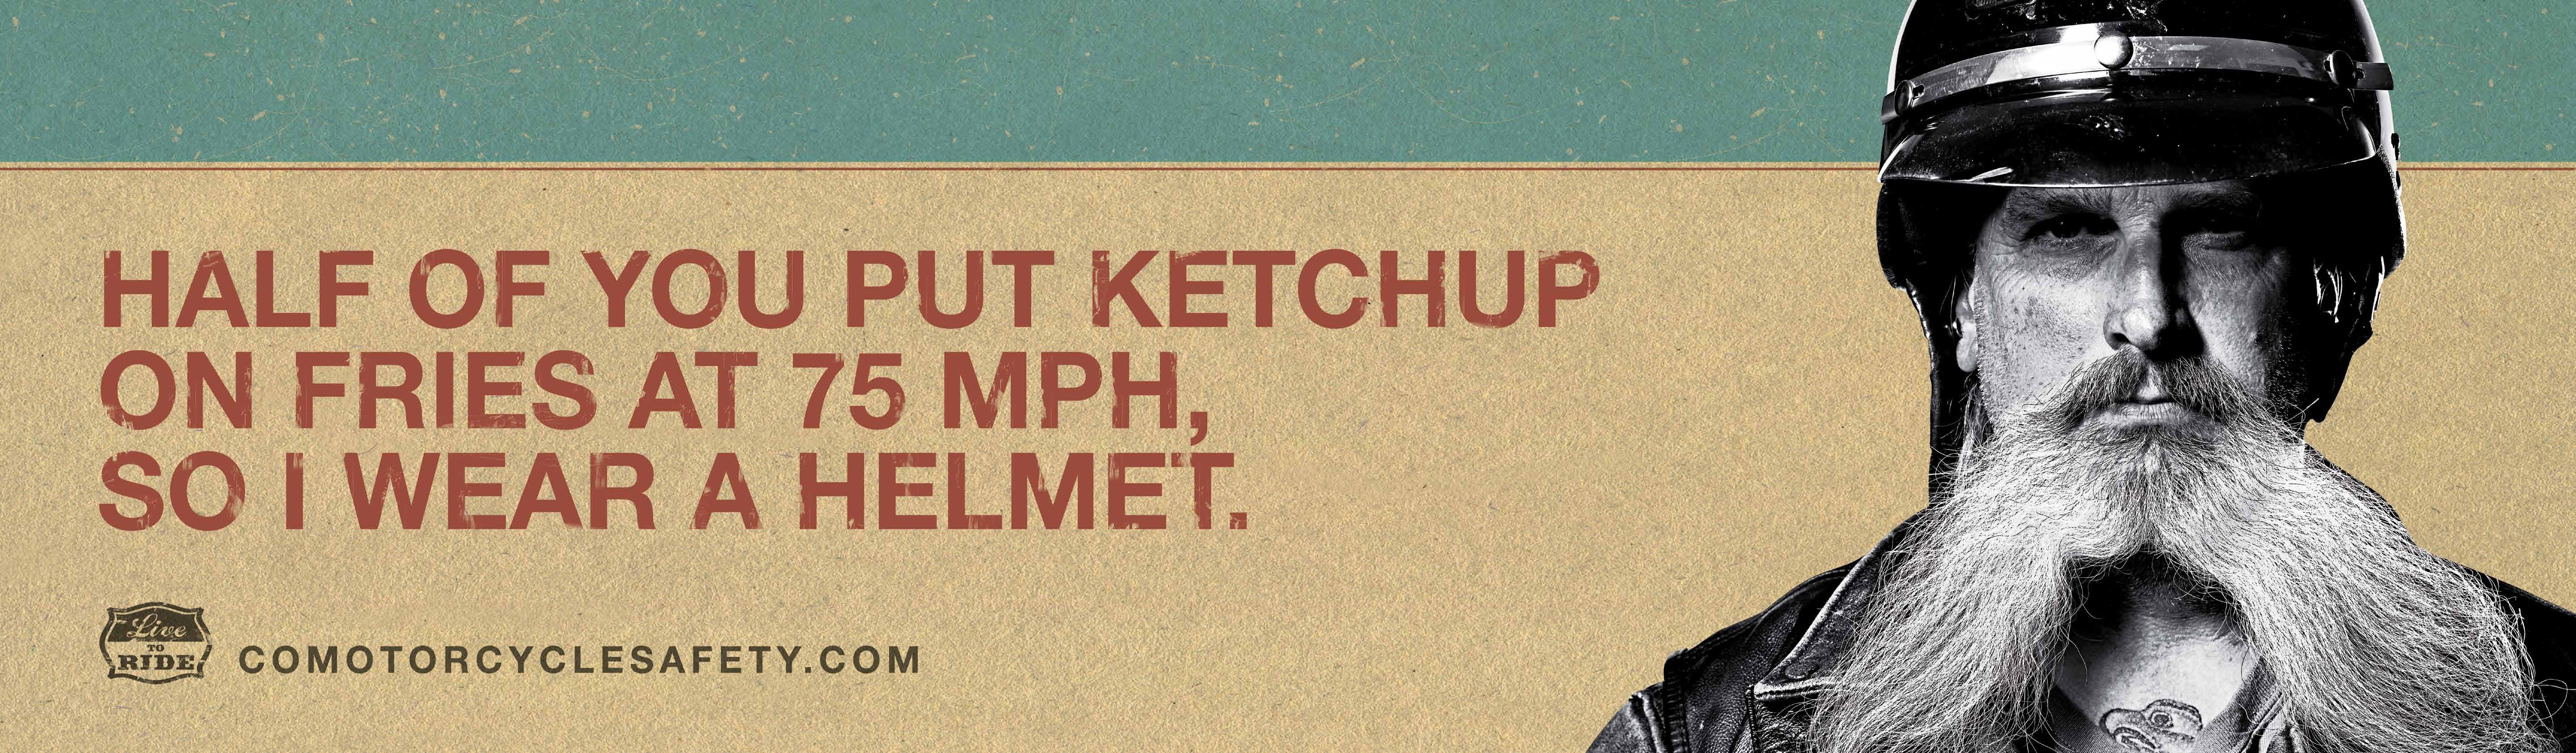 Ketchup_Billboard.jpg detail image